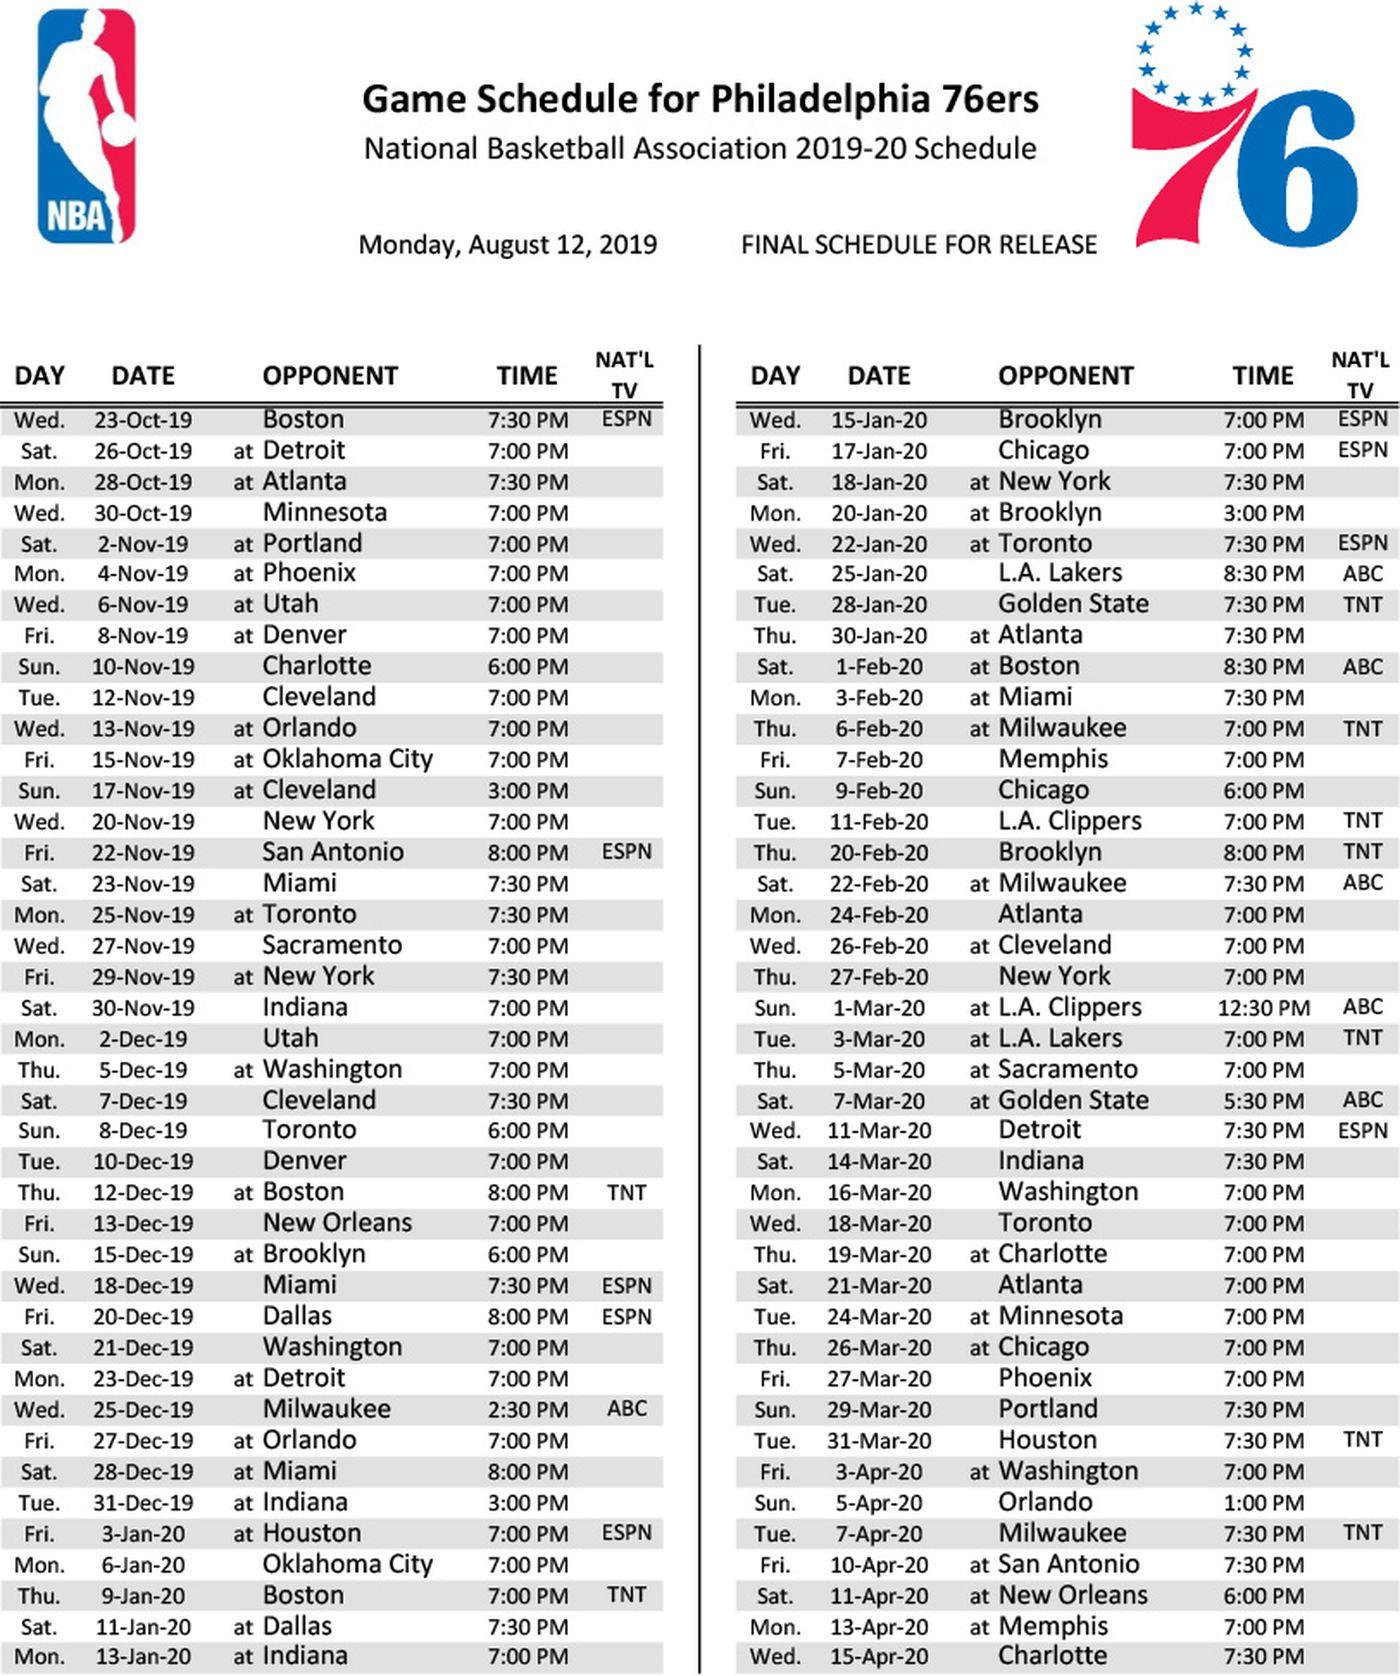 Lakers Schedule 2020.Sixers 2019 20 Schedule Open With Celtics Kawhi Leonard